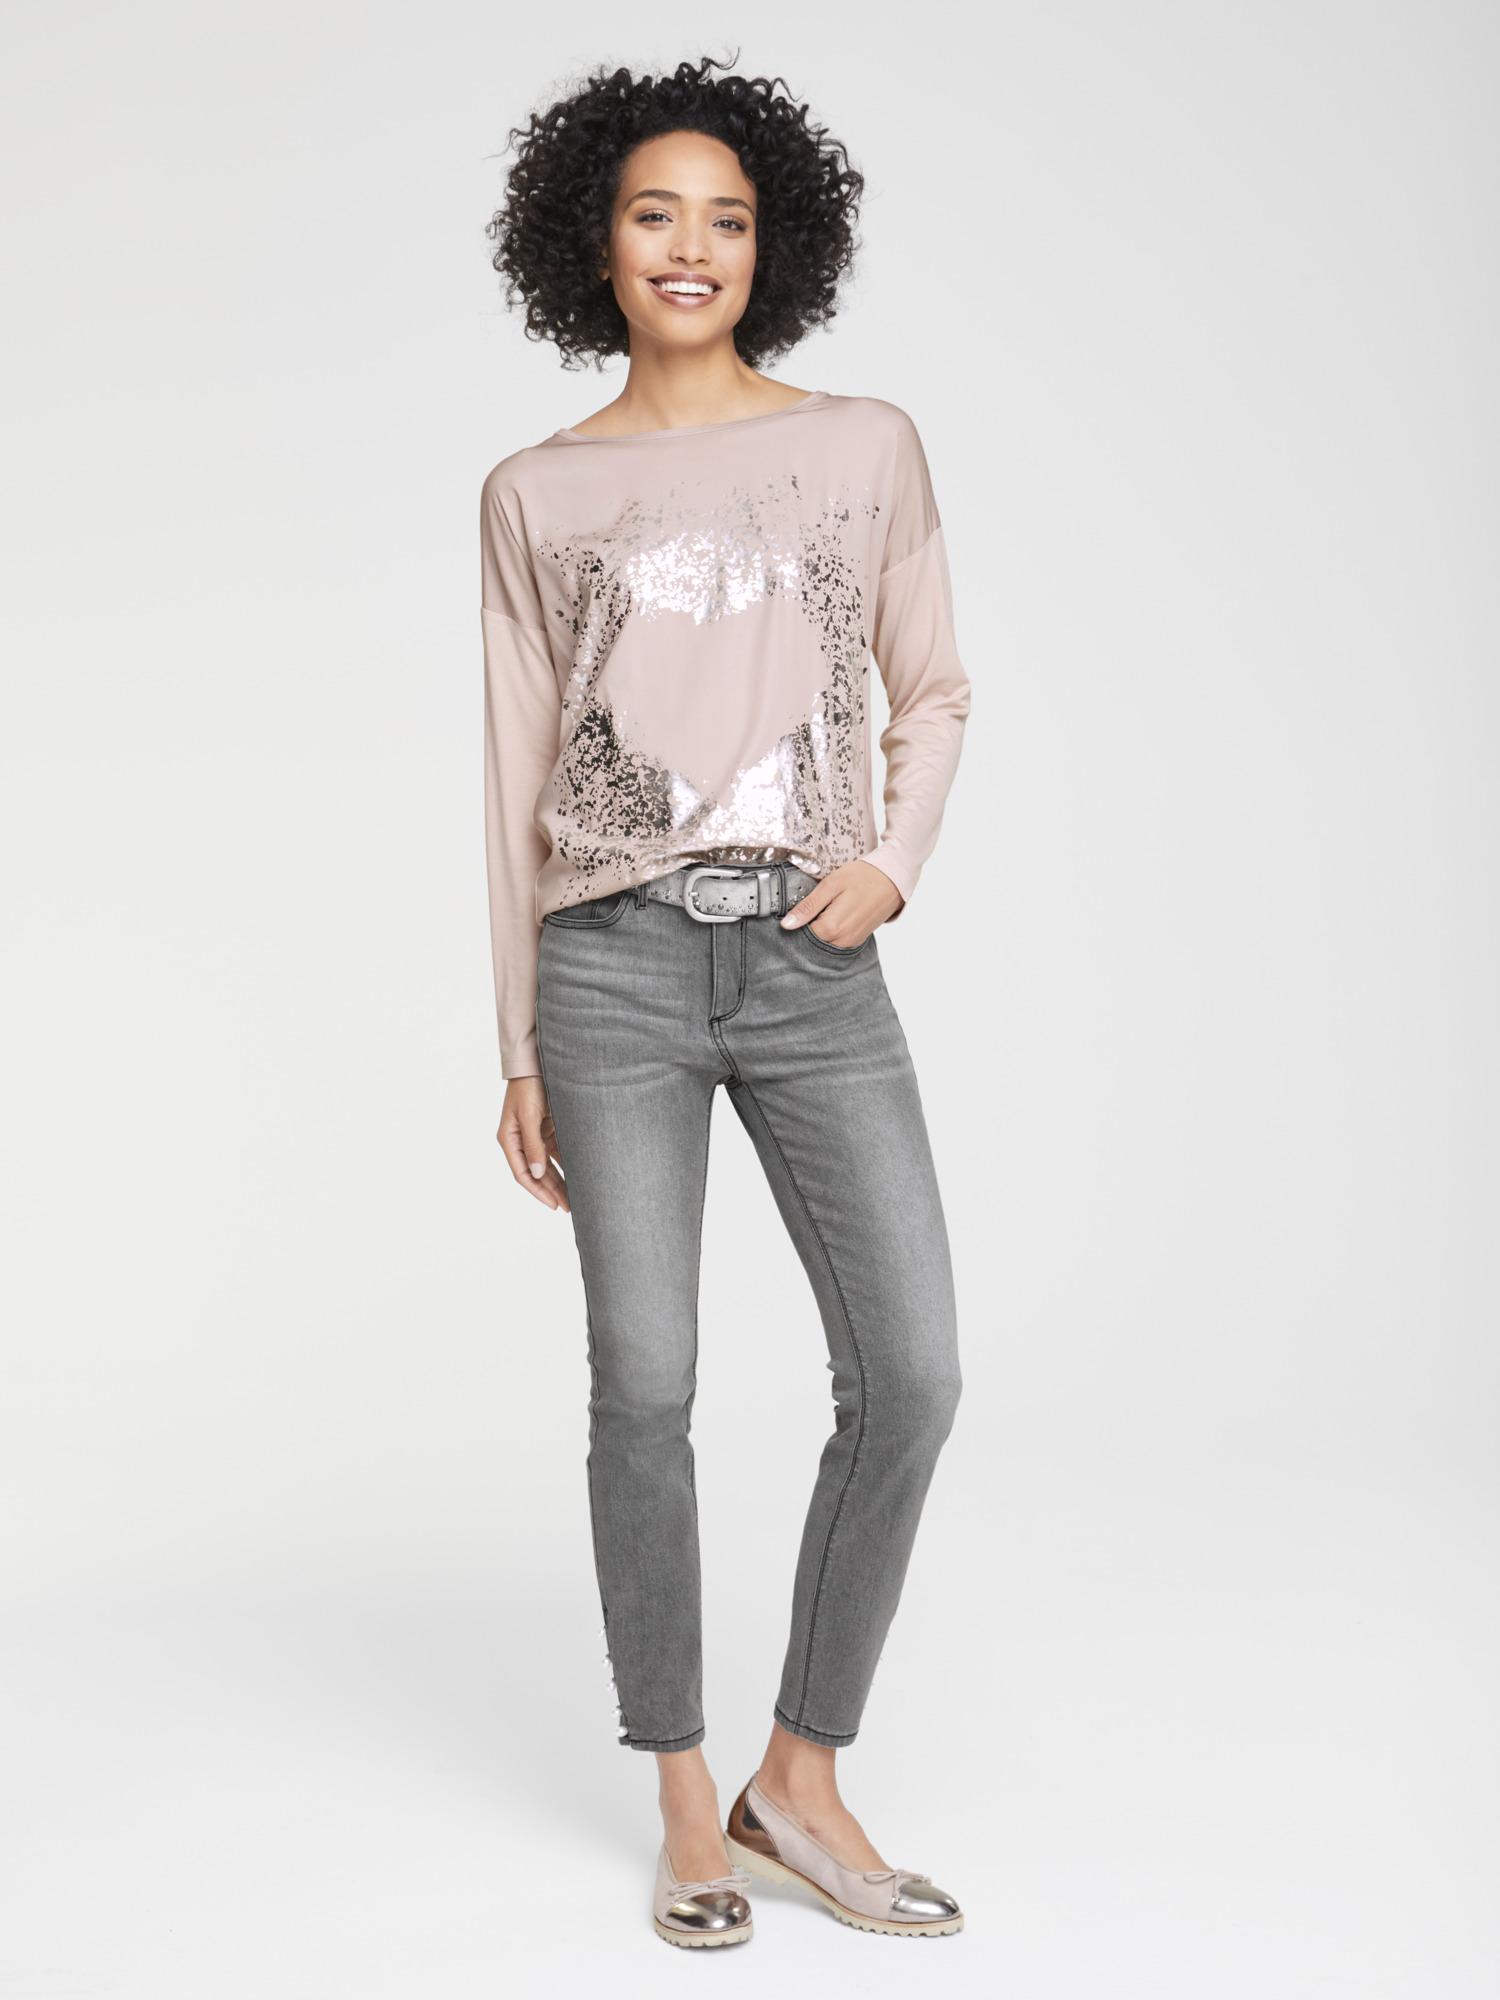 120 Komplette Outfits Für Damen Outfit Trends 2019 Bei Baur